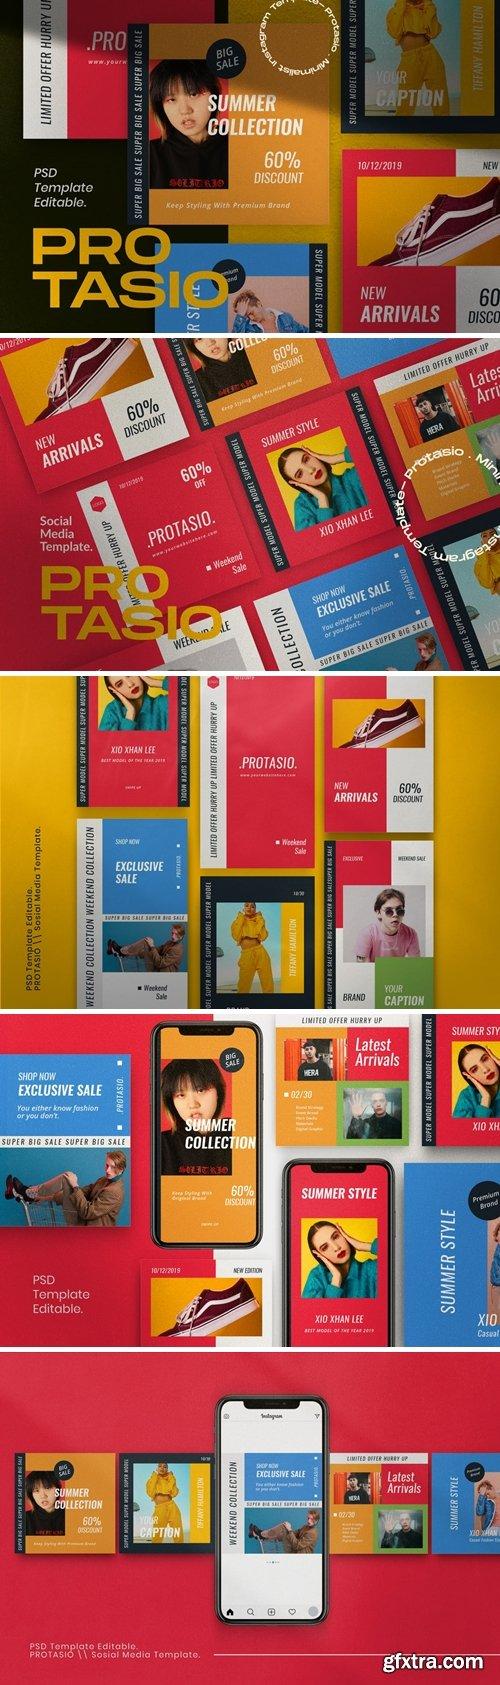 Protasio Fashion Instagram Social Media Pack 1